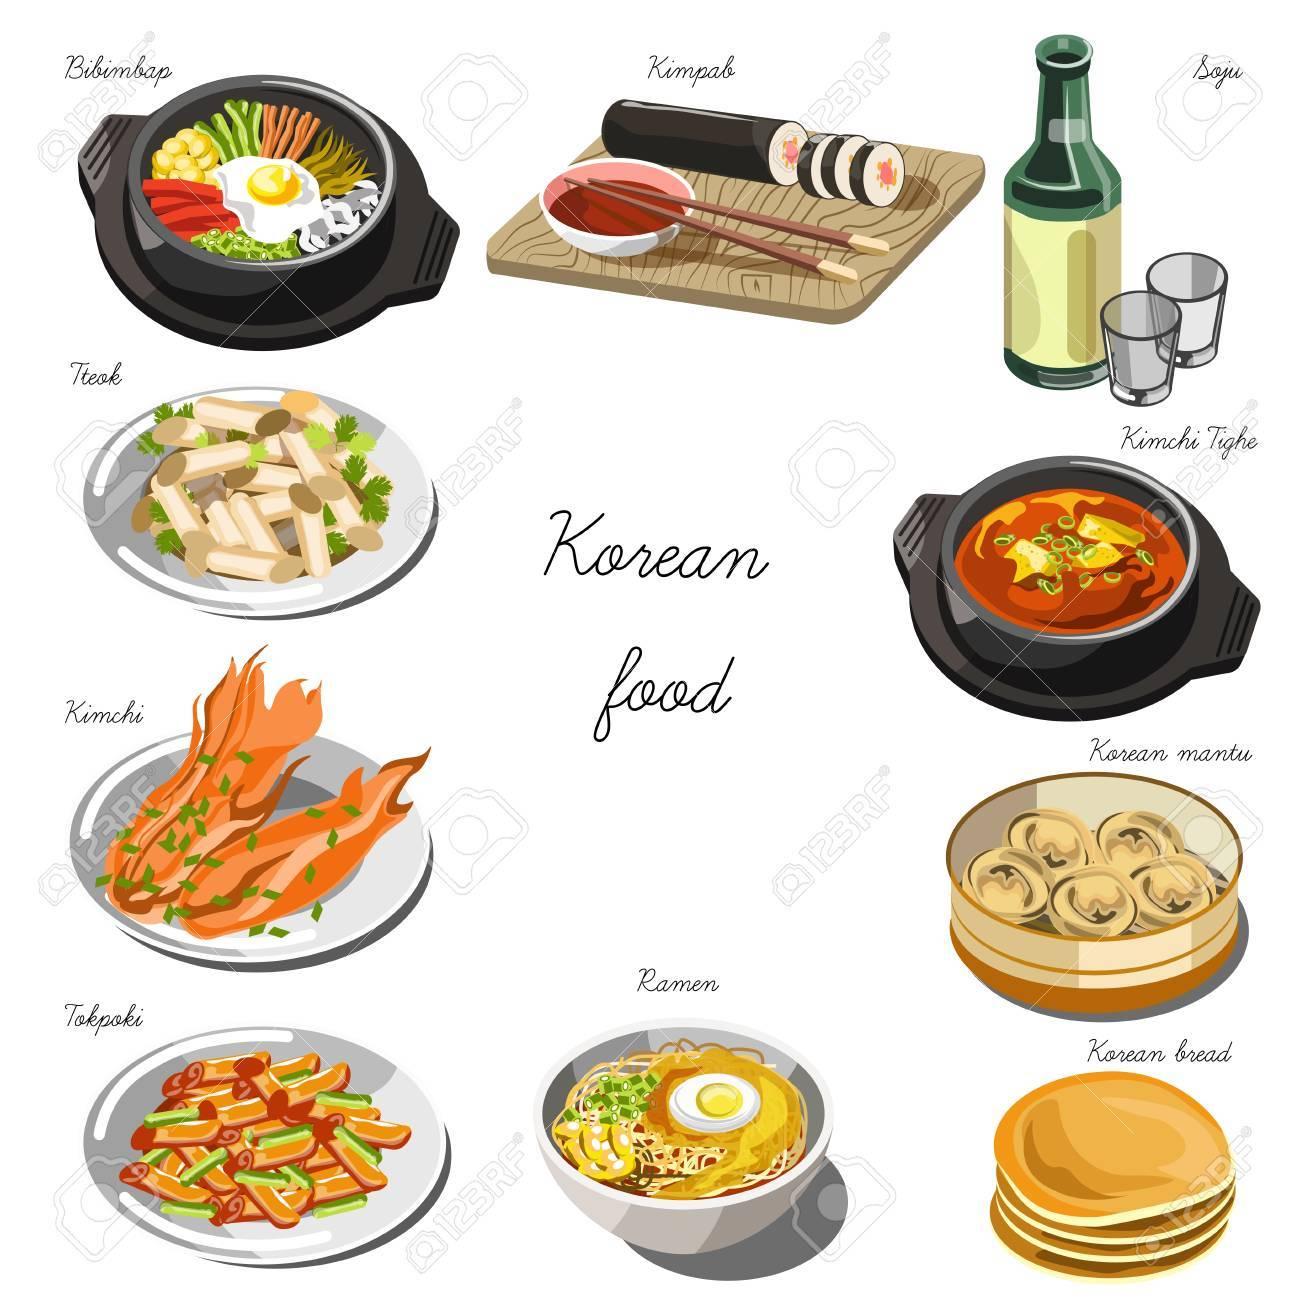 Vettoriale - Set Cucina Coreana Collezione Di Piatti Alimentari Per ...